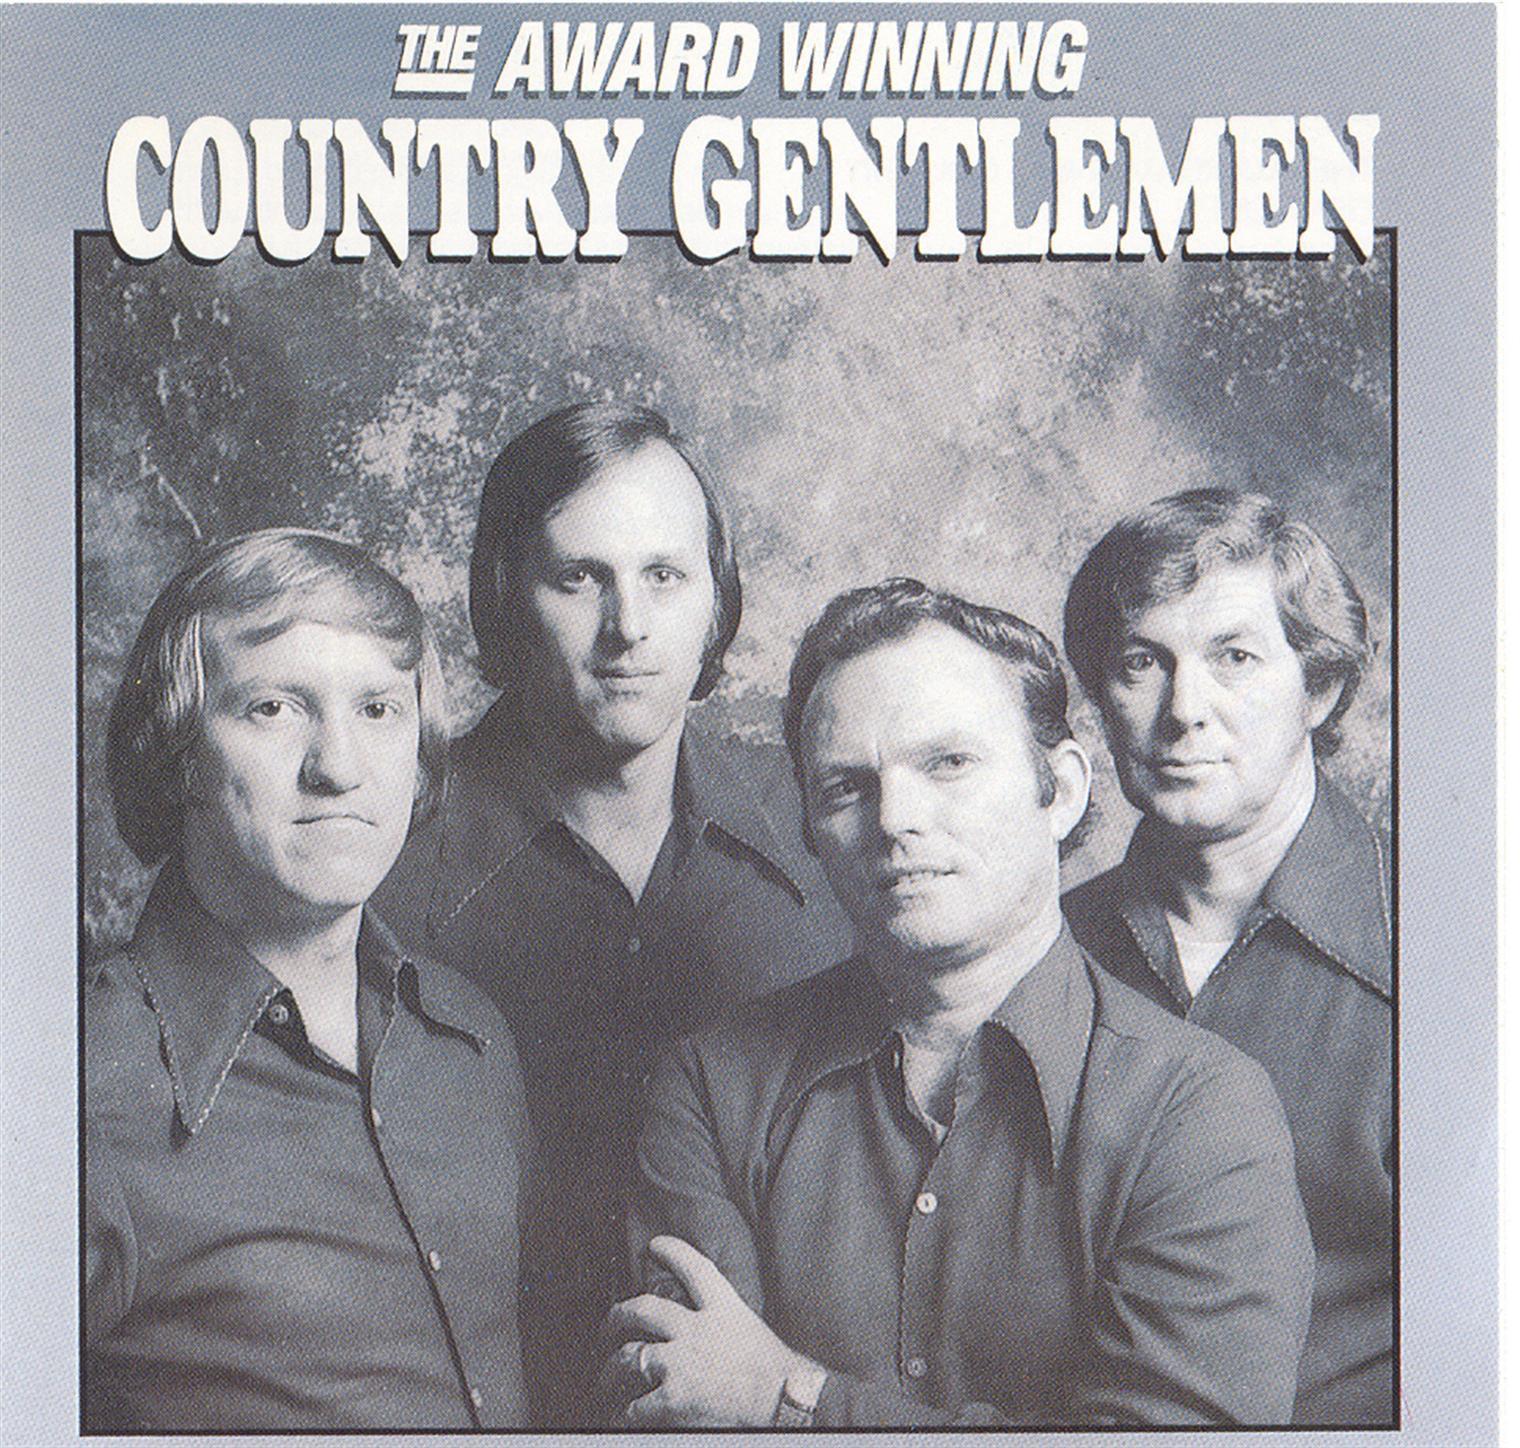 The Award Winning Country Gentlemen